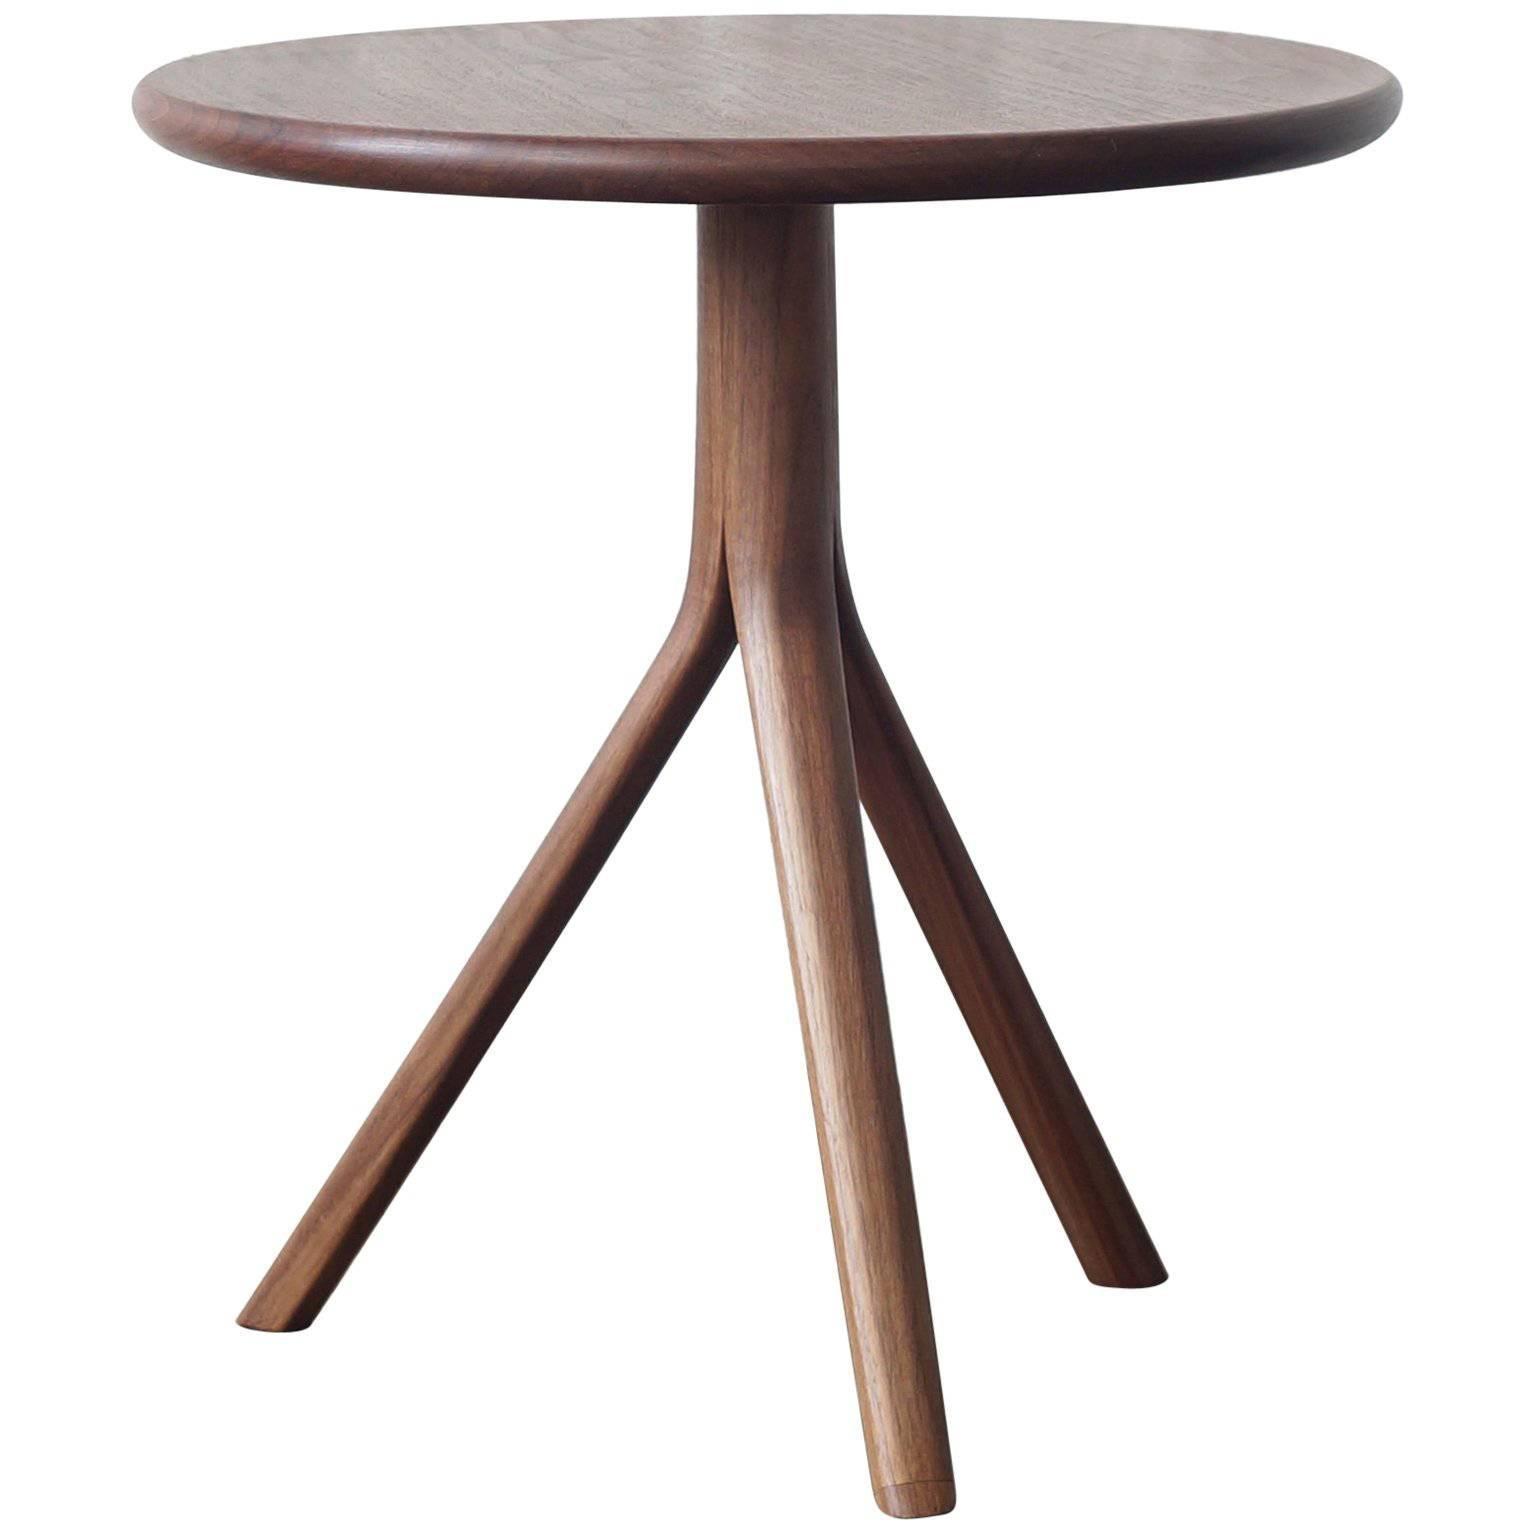 TOTEM Side Table by Karen Chekerdjian, Contemporary Marble Side ...